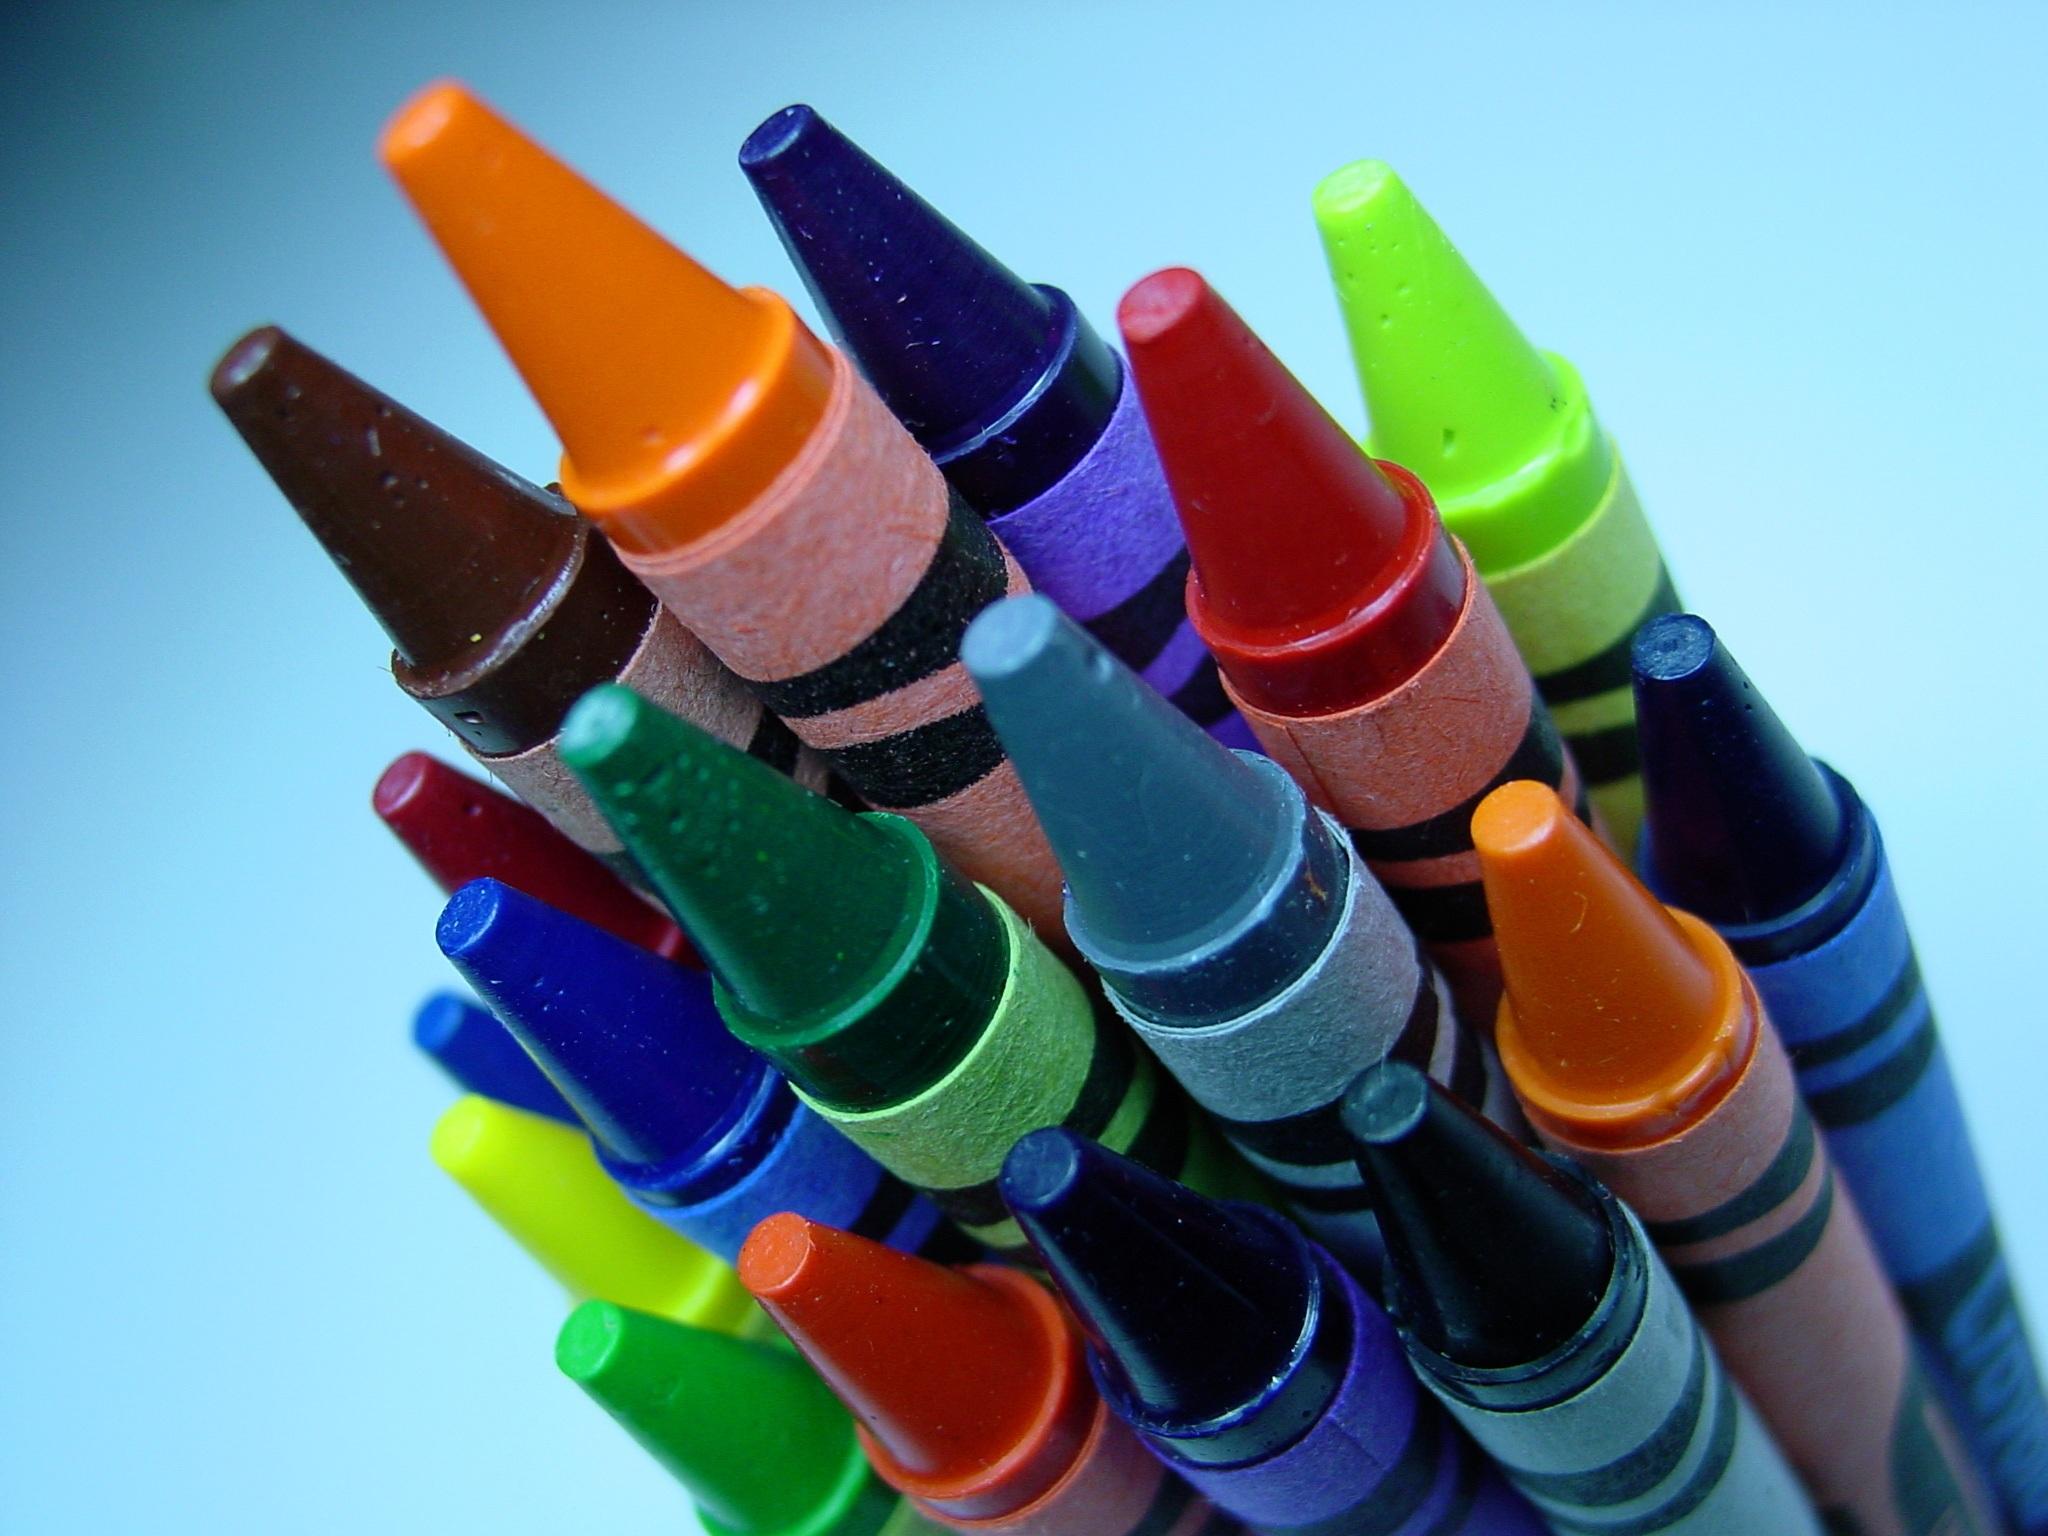 Fotos gratis : mano, creativo, dedo, juguete, infancia, lápiz de ...